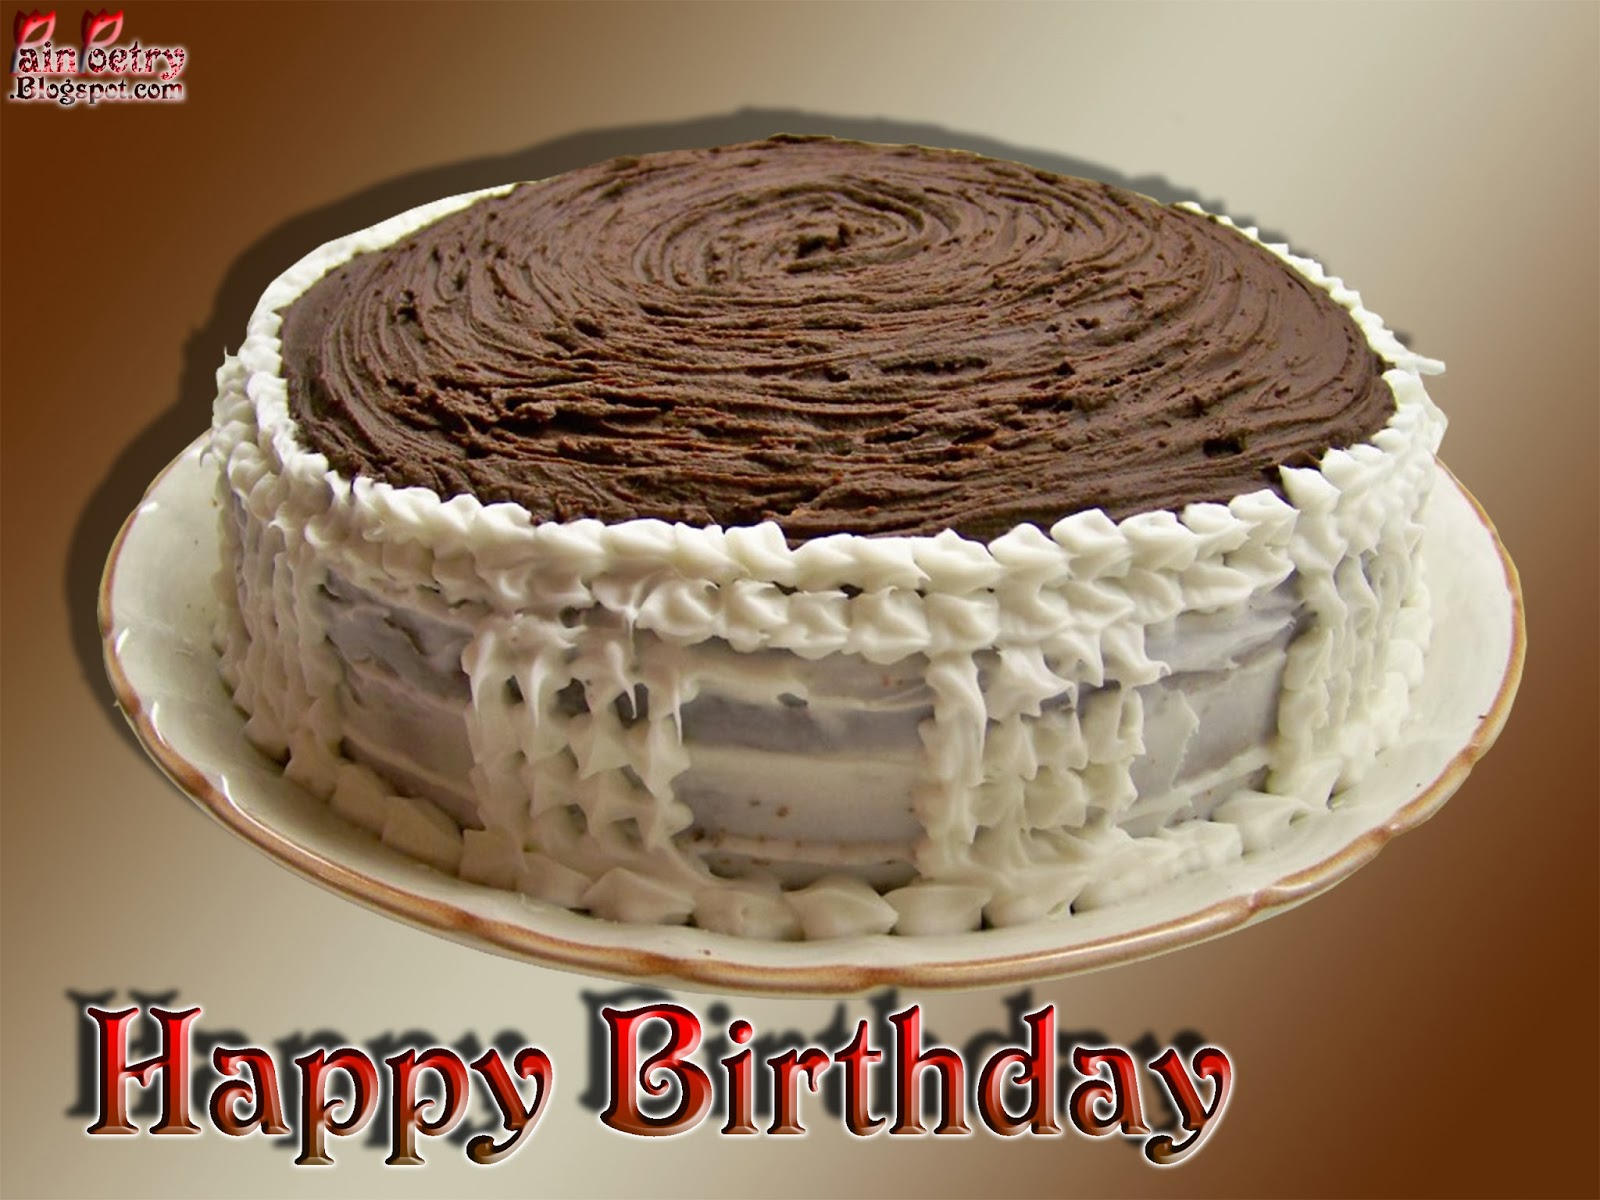 Happy-Birthday-Cake-With-Cream-And-Chocolate-Image-HD